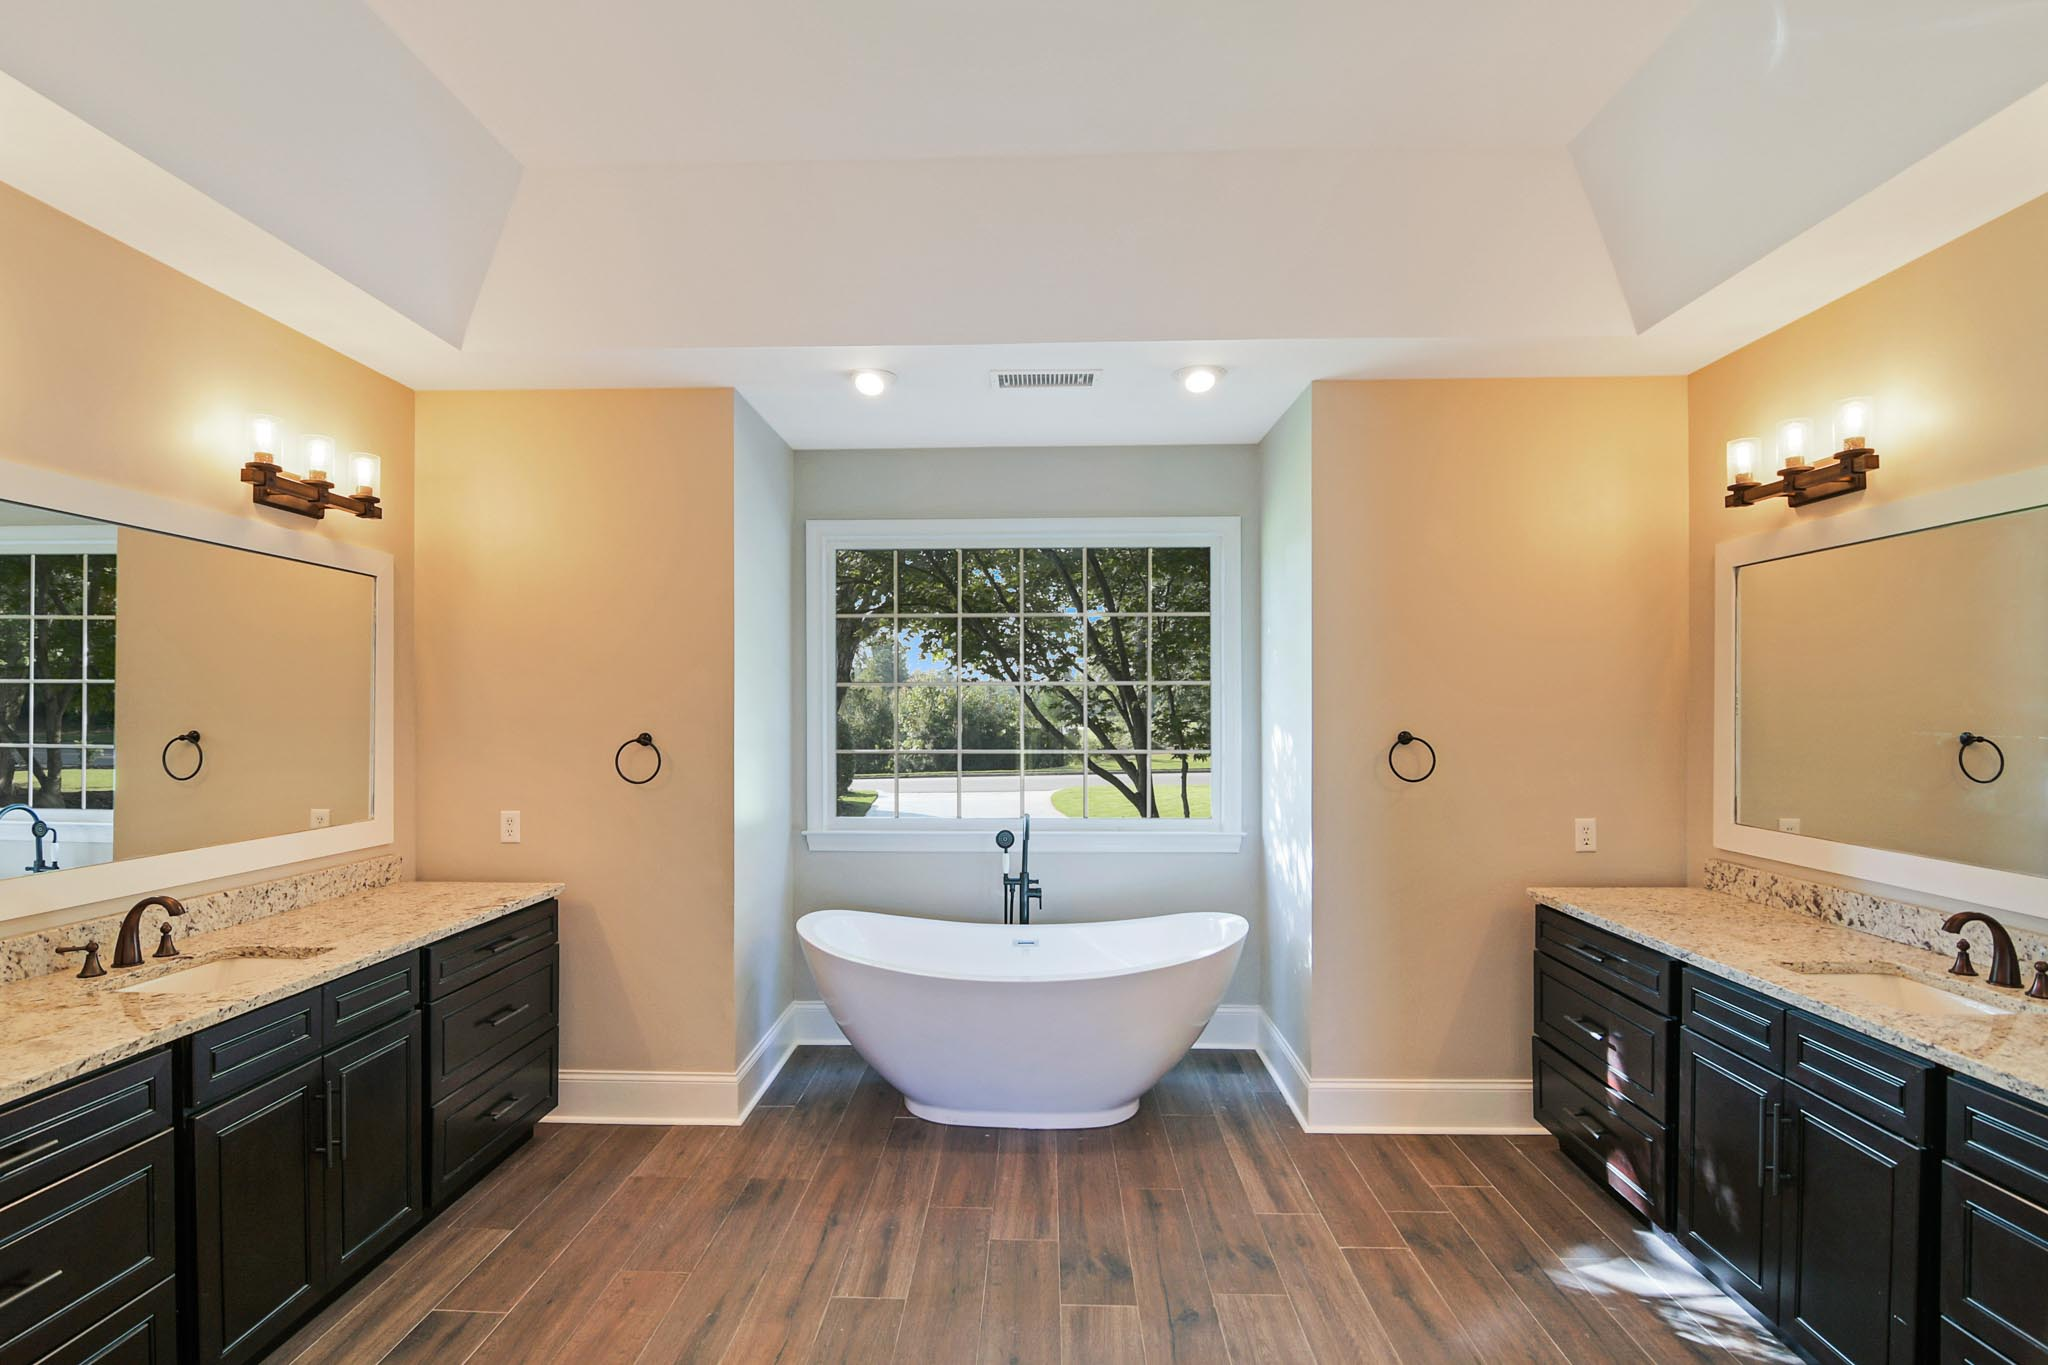 real_estate_photographer_bathroom_photography-4.jpg